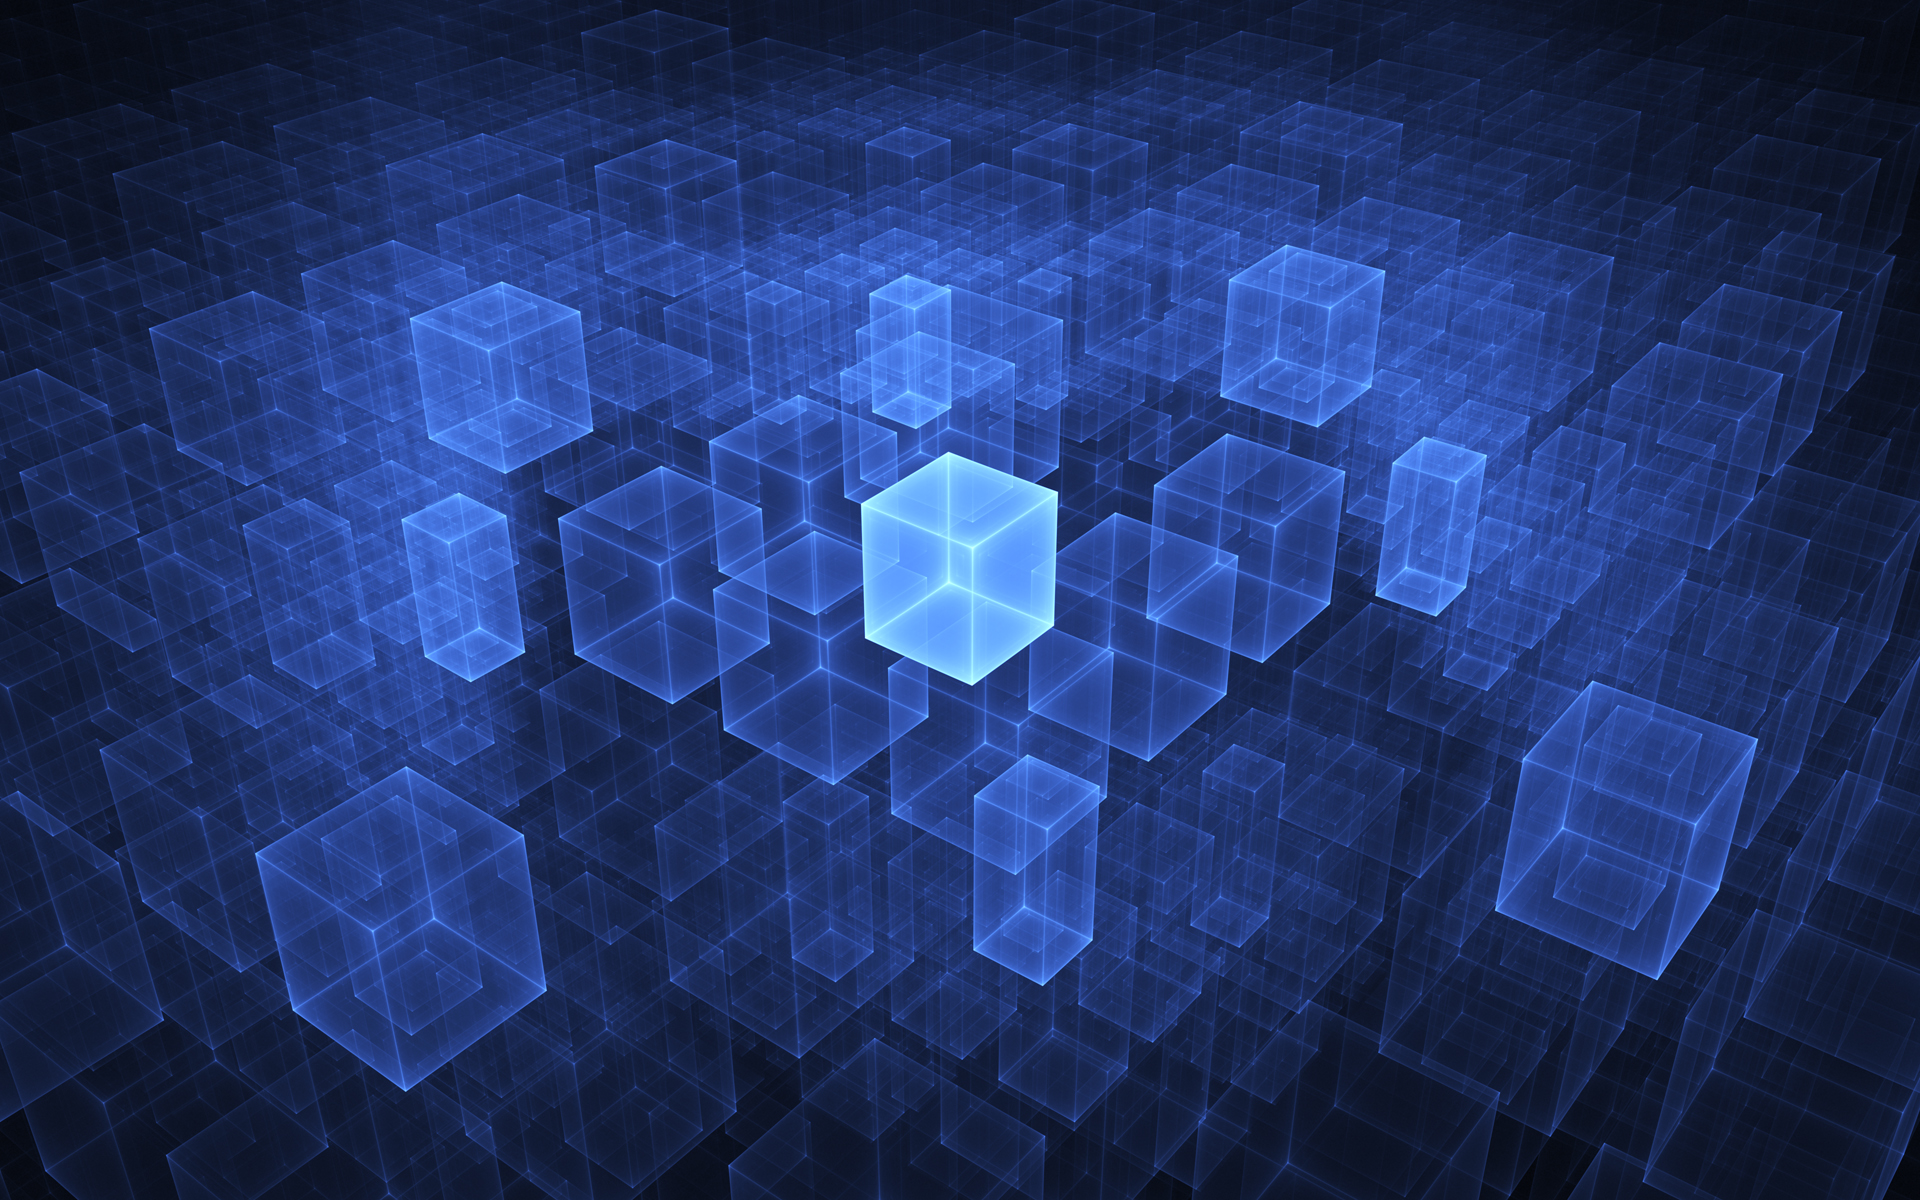 Wallpaper Digital Blue Cubes 1920x1200